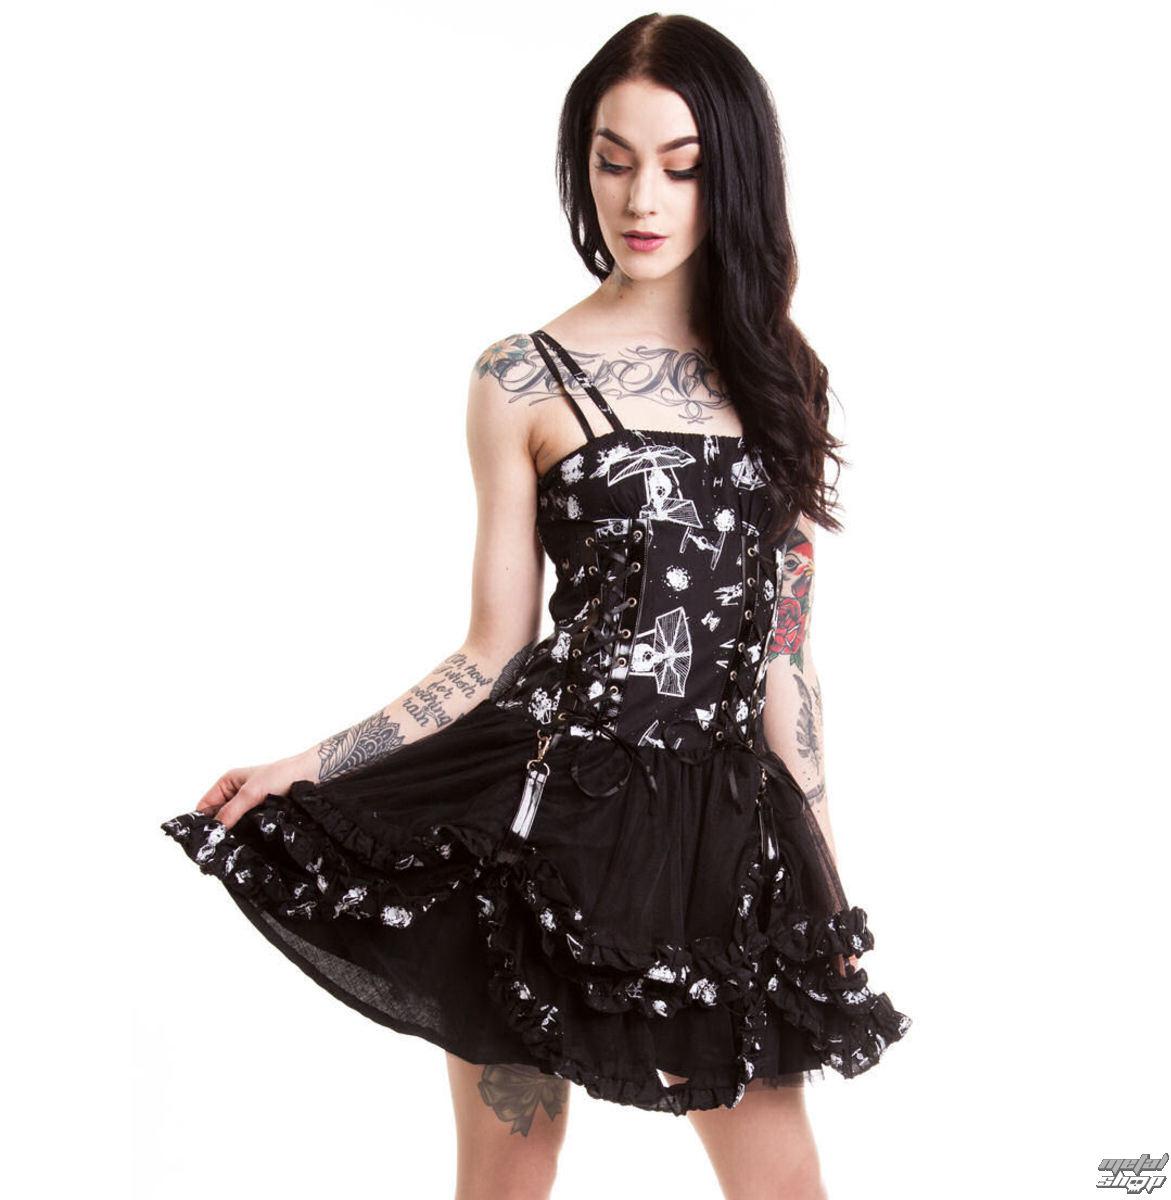 075fab89851b šaty dámské DISNEY - STAR WARS - Galaxy Empire - Black - POI101 ...